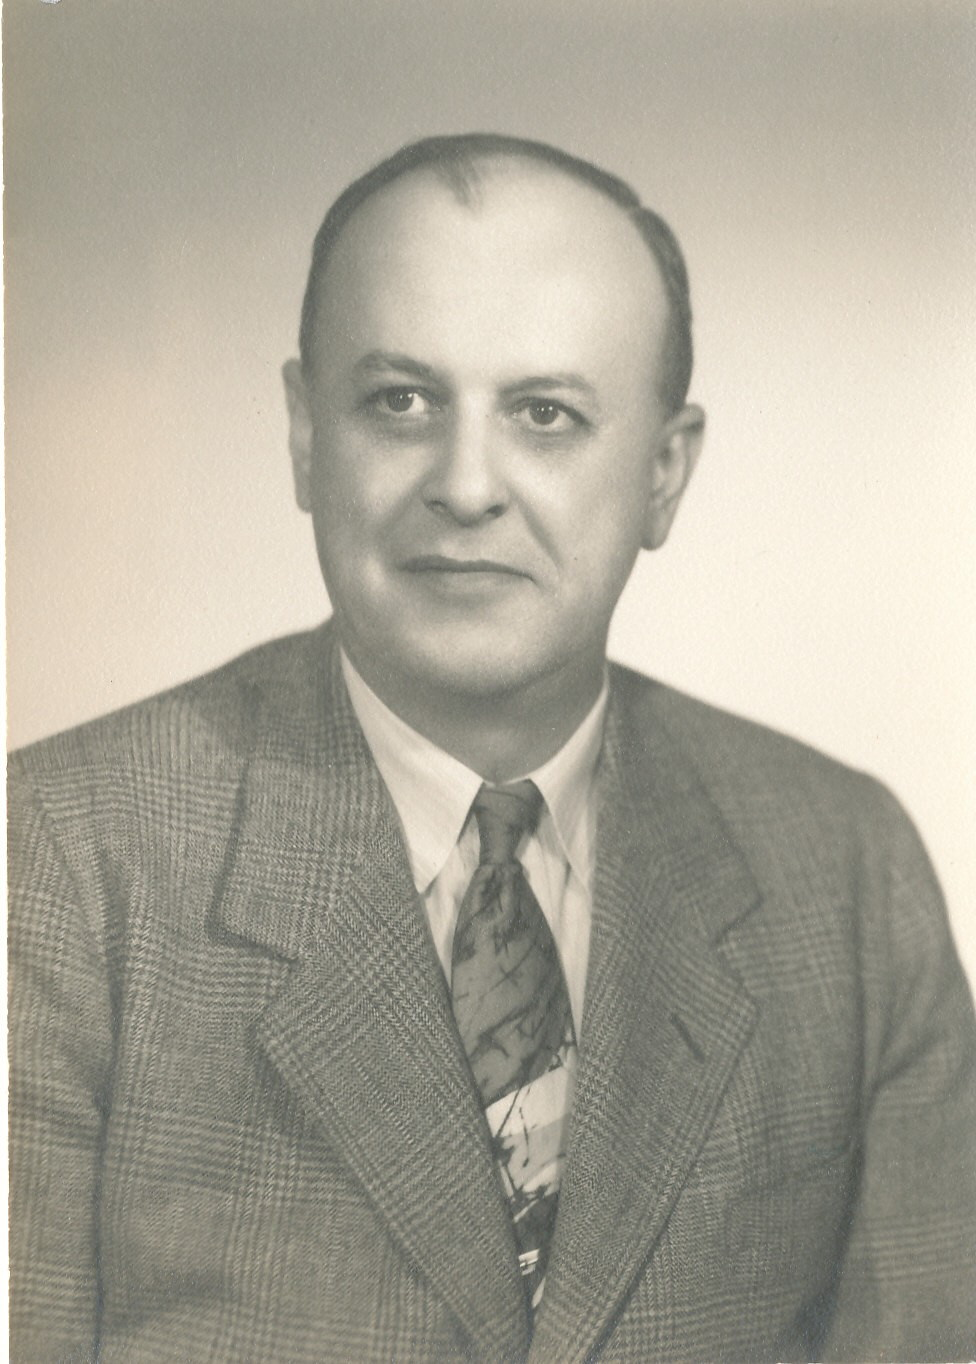 James R Wilson